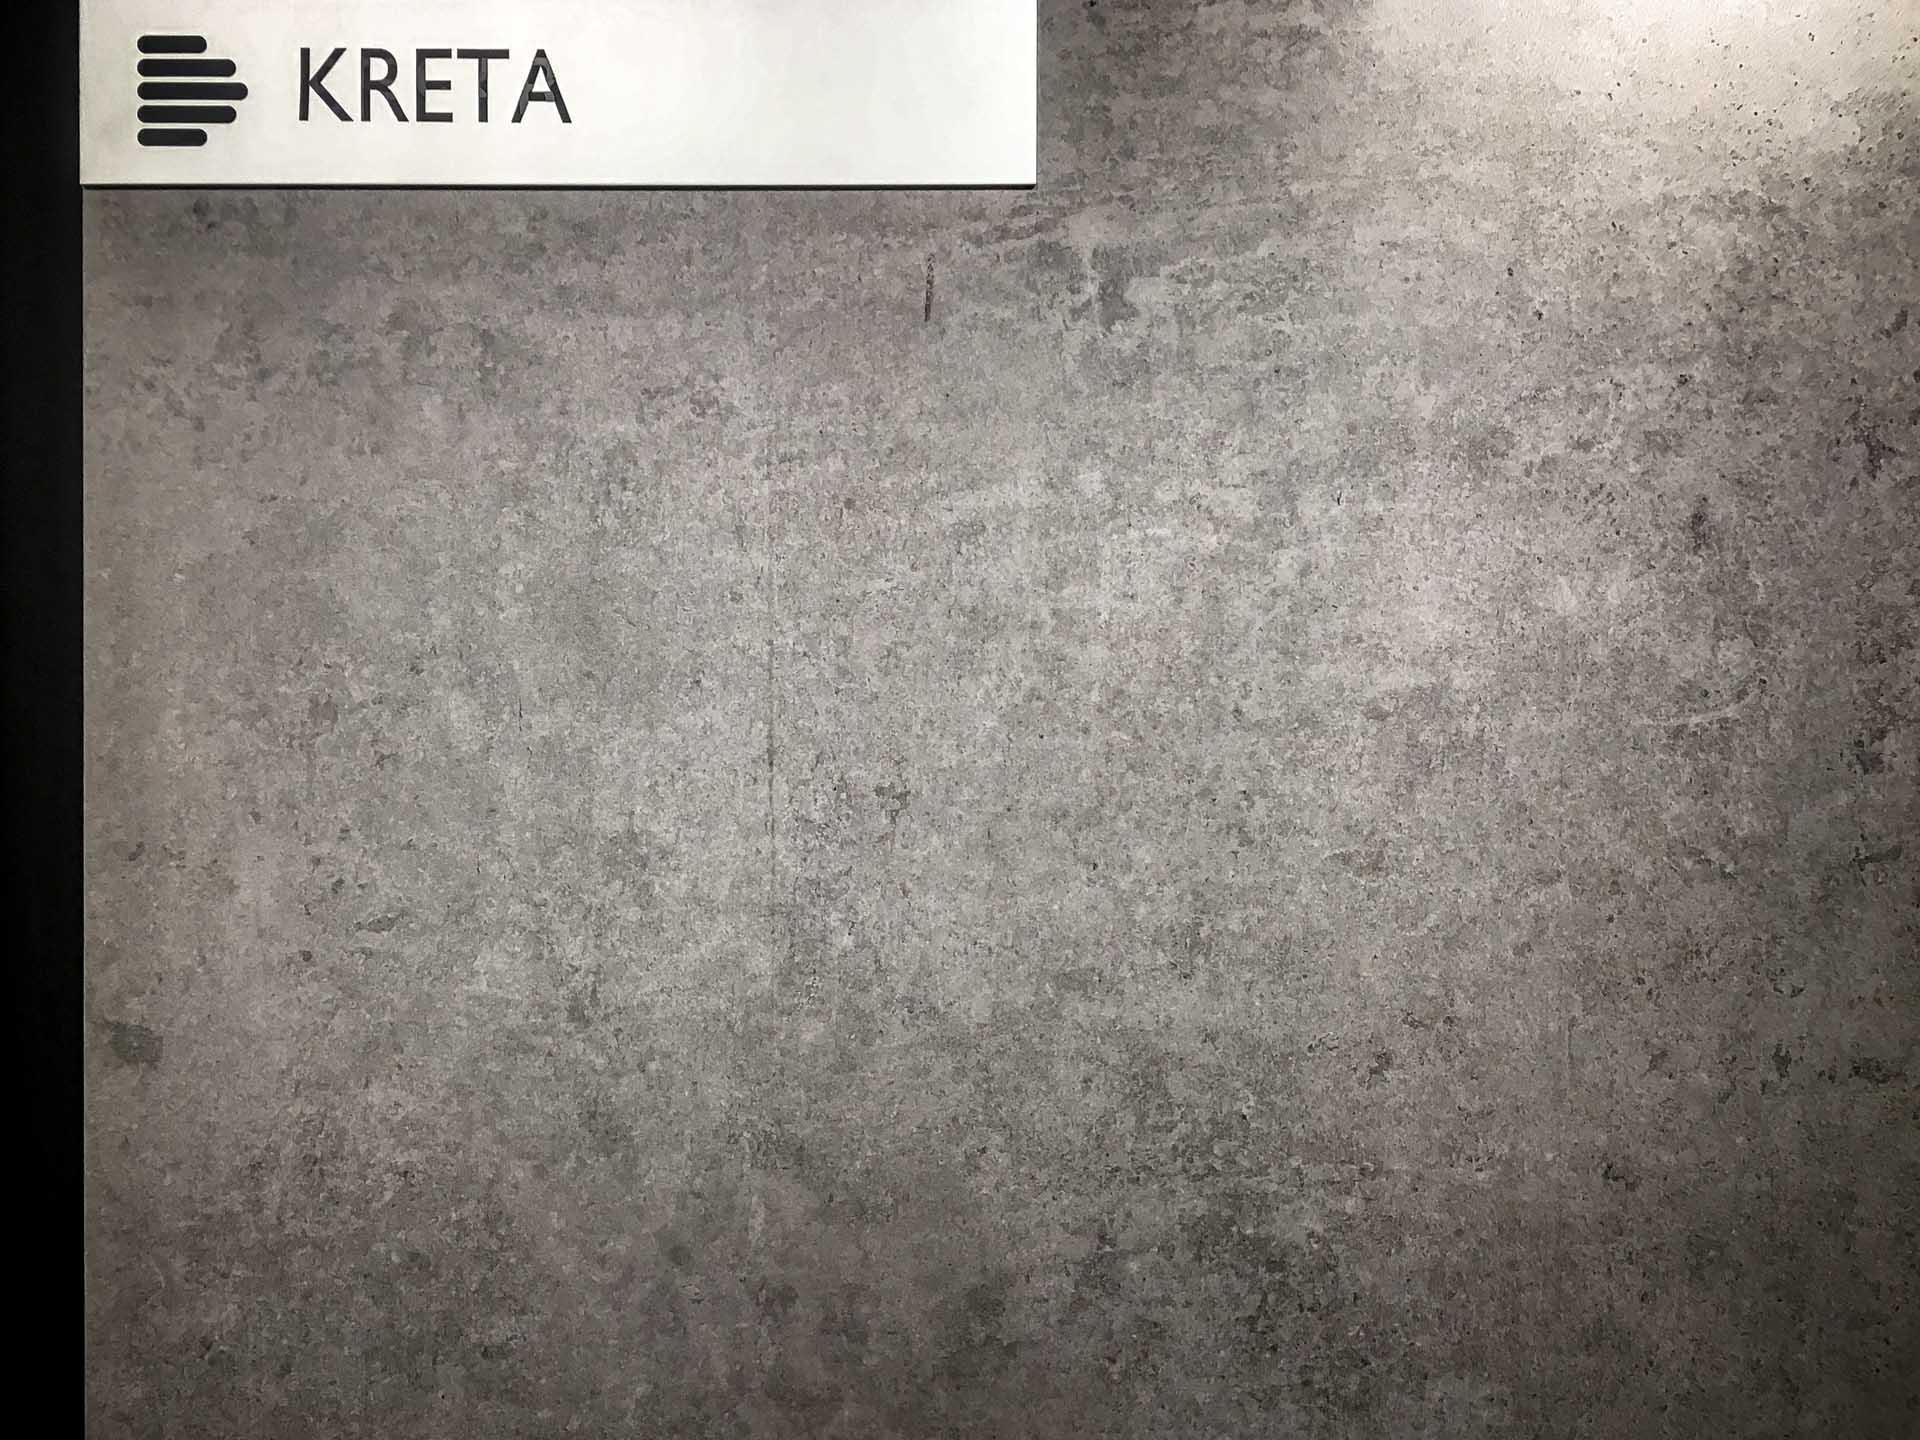 kreta cosentino visit hook 2018 surrey quartz worktops silestone 203515 a